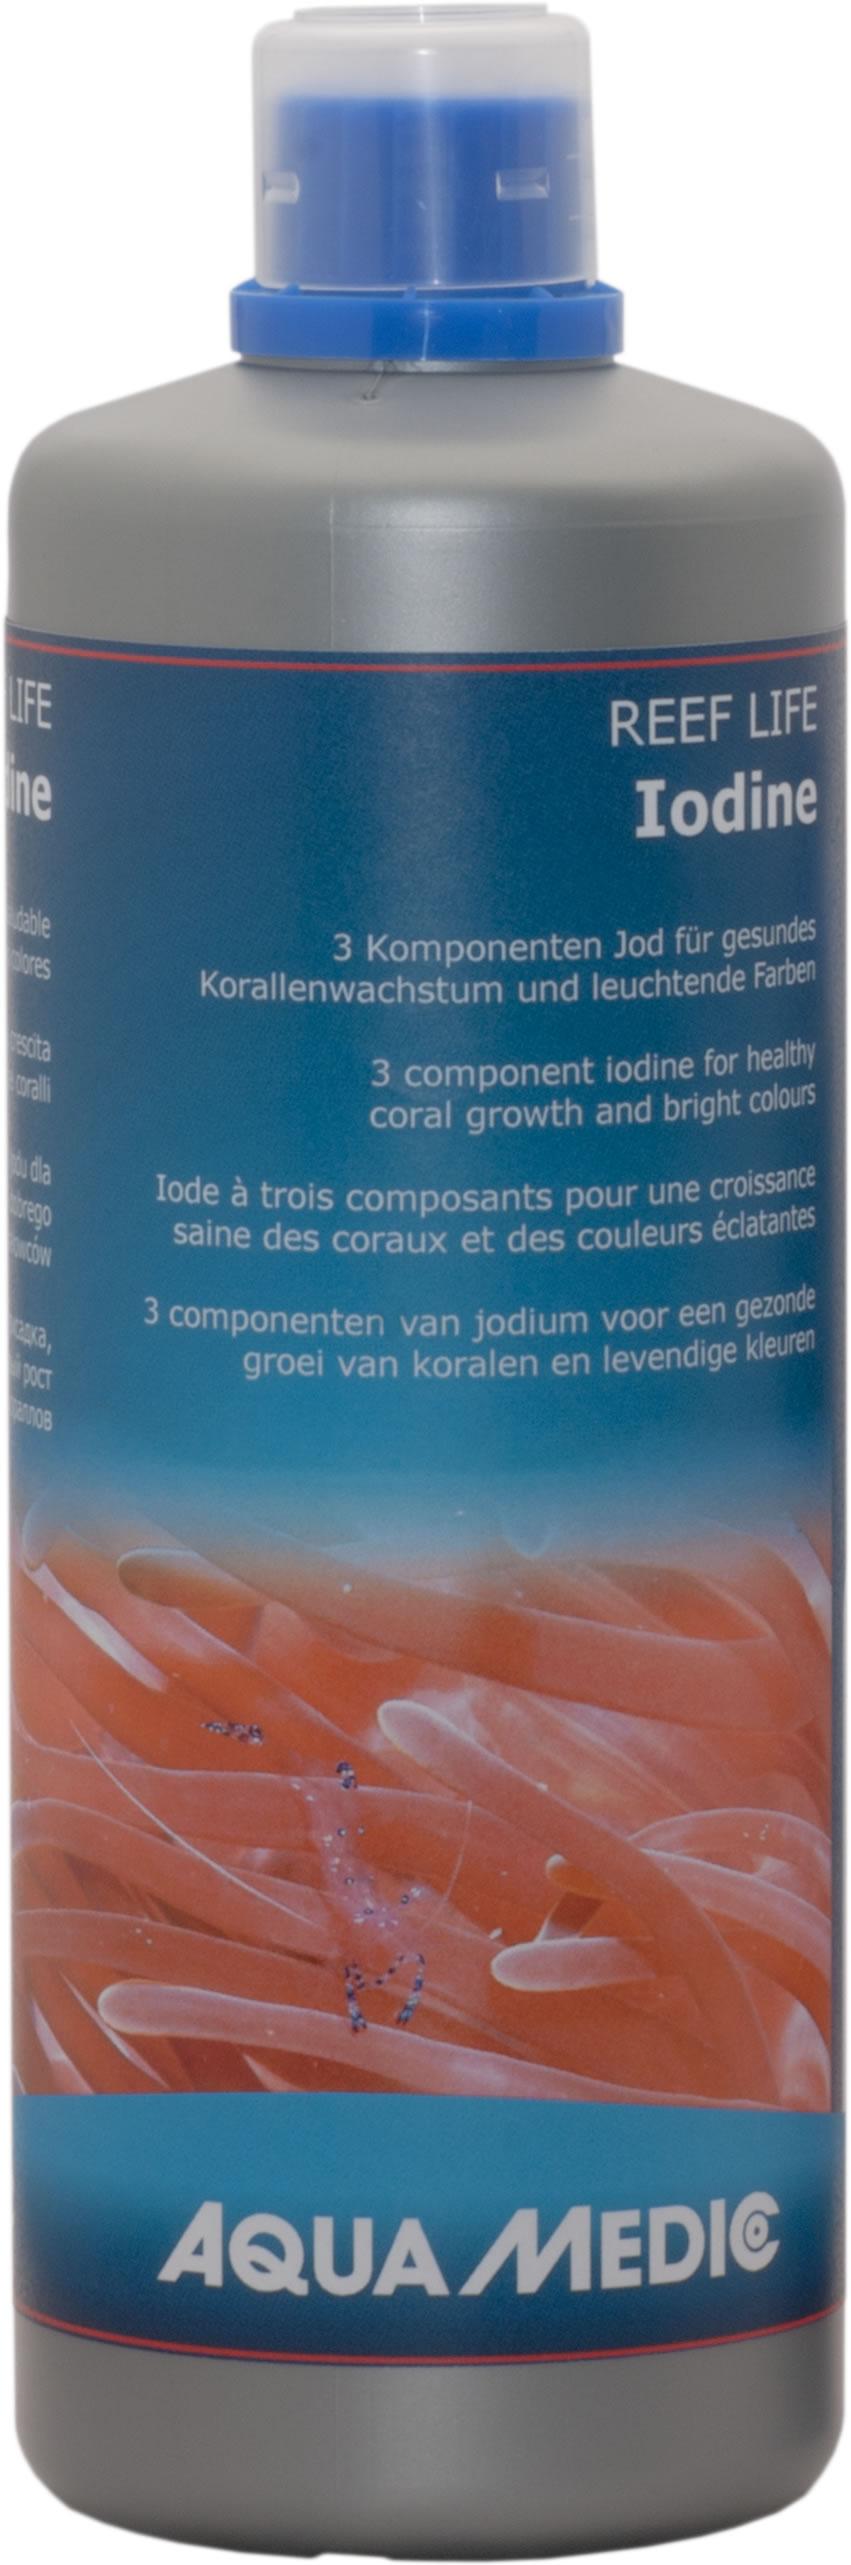 Aqua Medic REEF LIFE Iodine